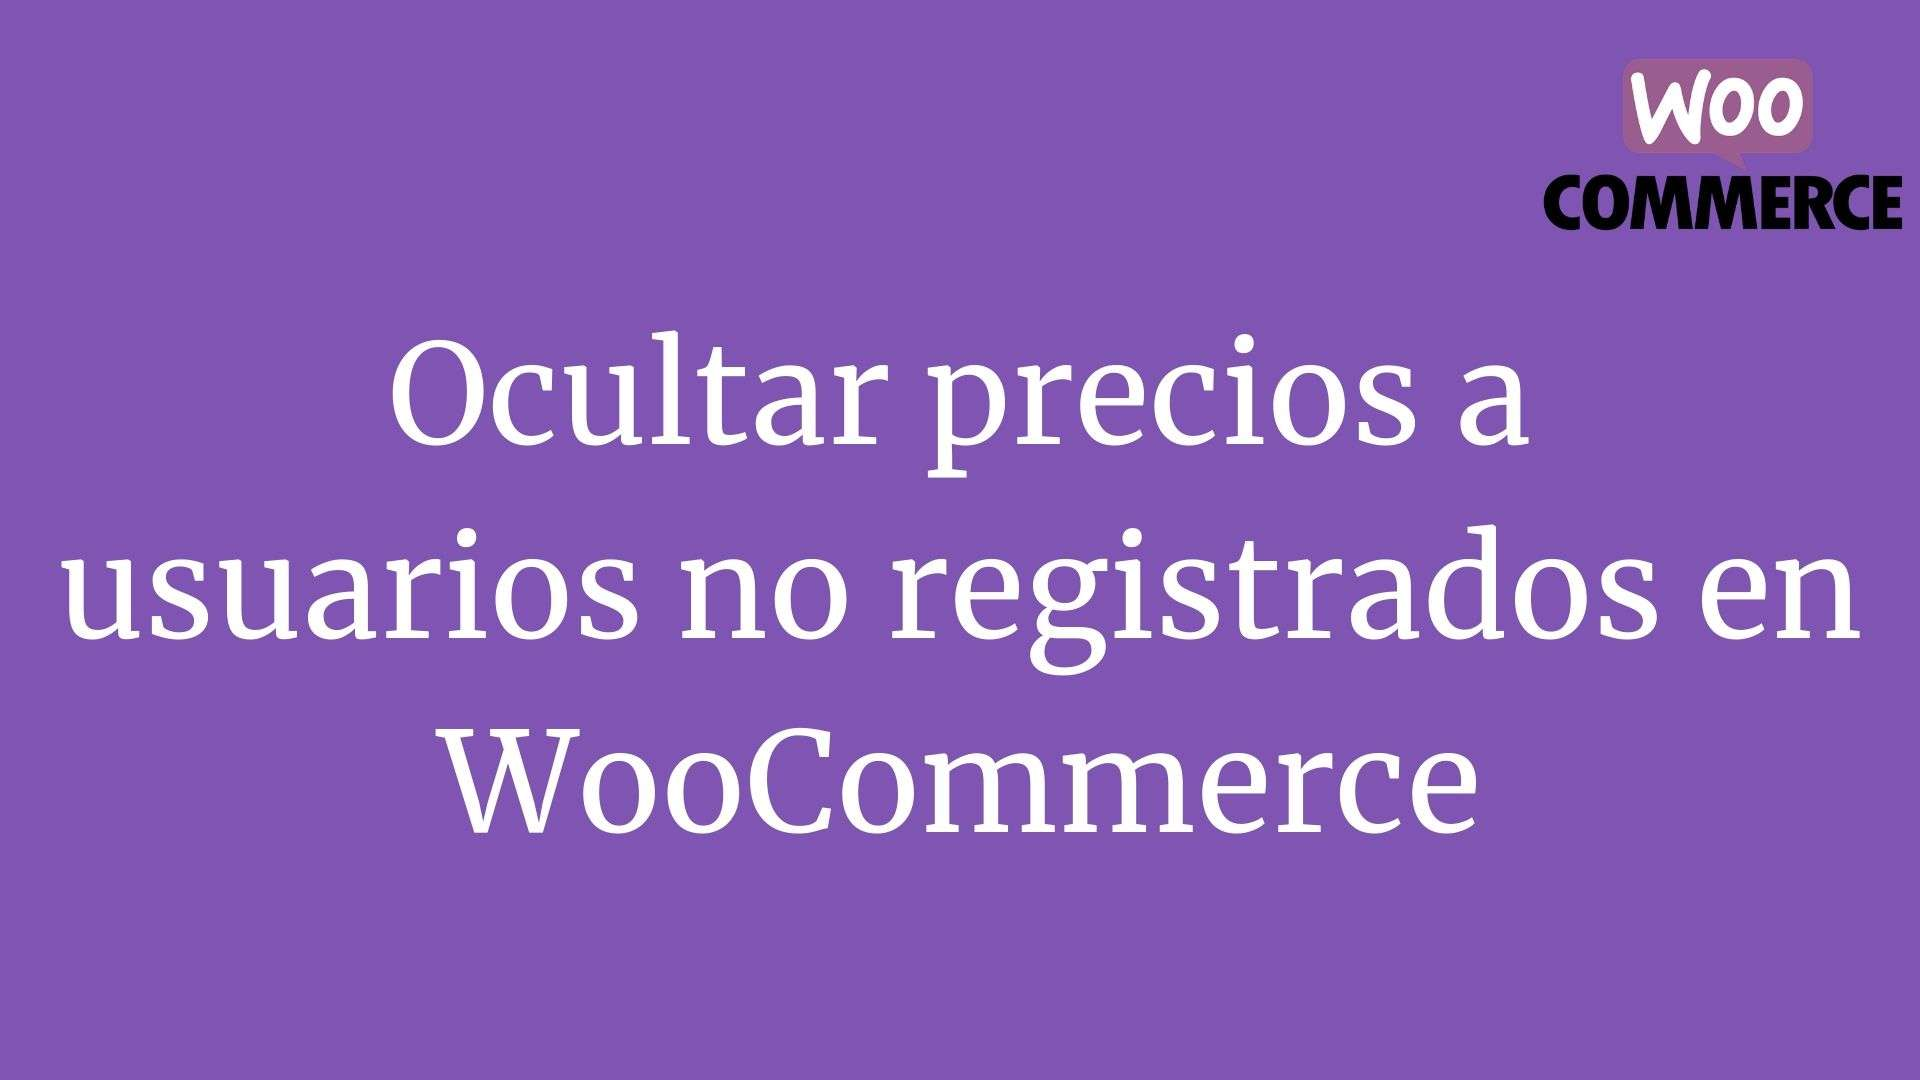 Ocultar precios a usuarios no logueados en WooCommerce